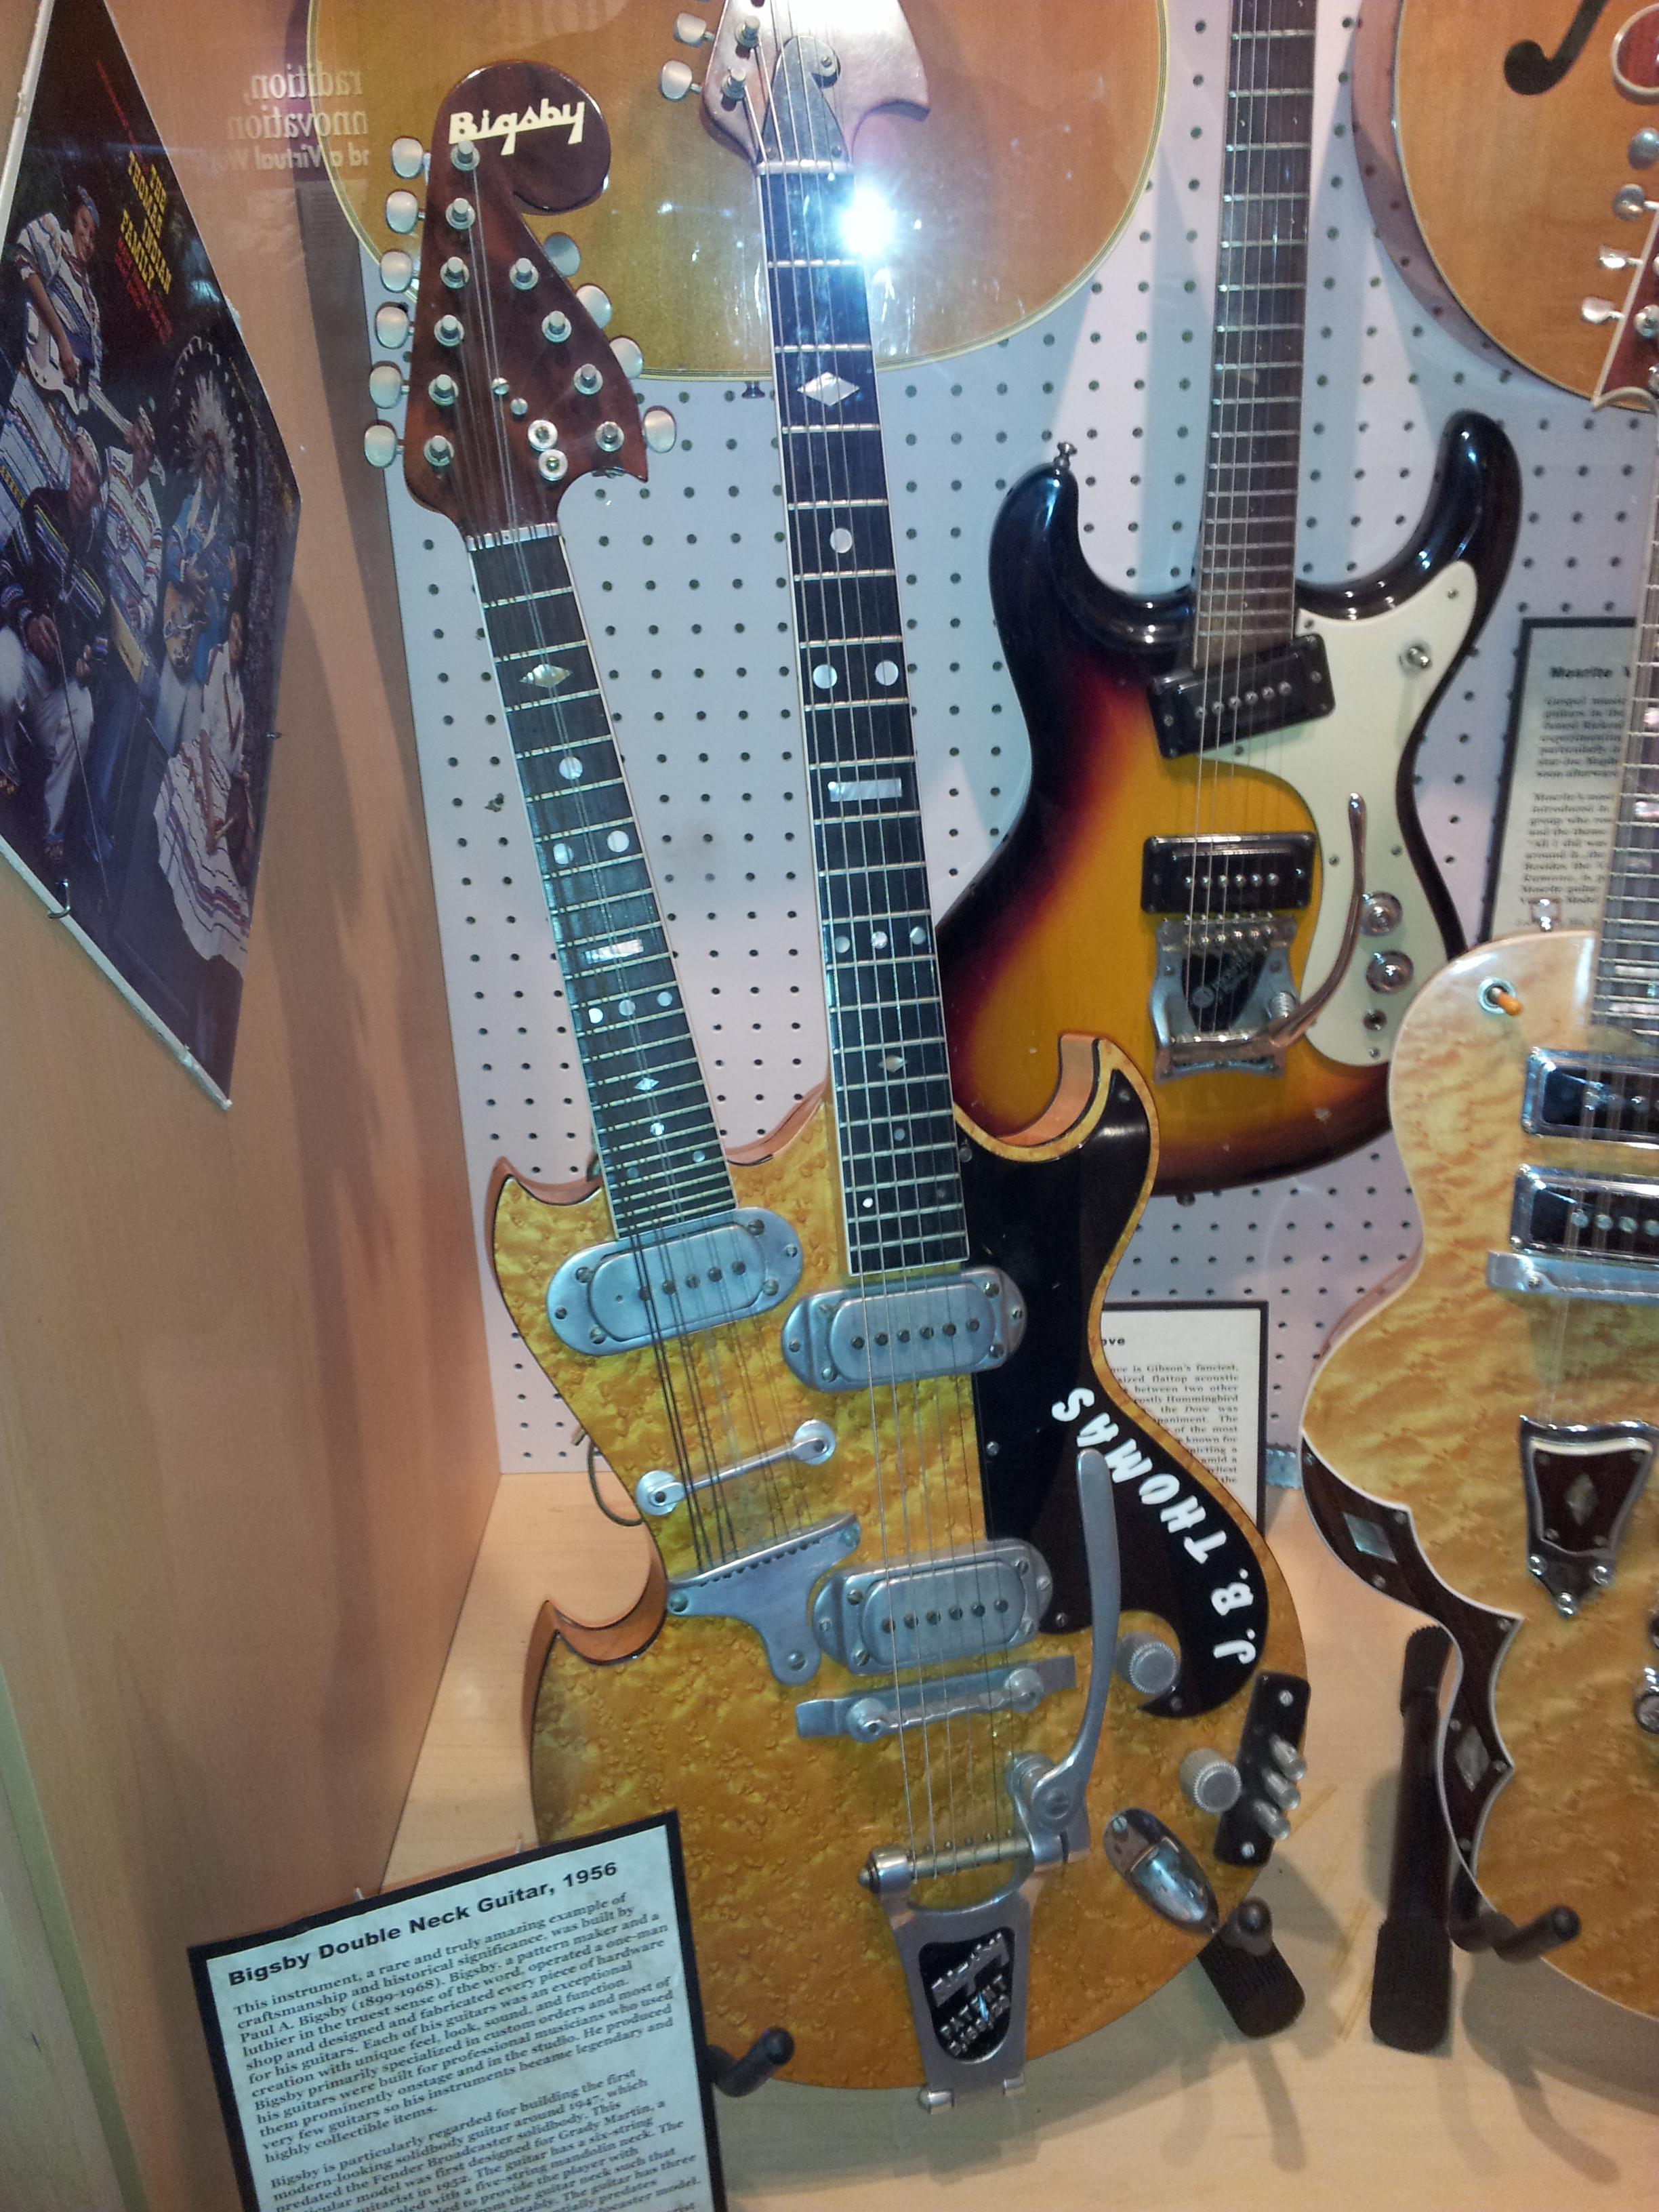 file bigsby double neck guitar 1956 mosrite harvey double neck guitar 1957 museum of. Black Bedroom Furniture Sets. Home Design Ideas